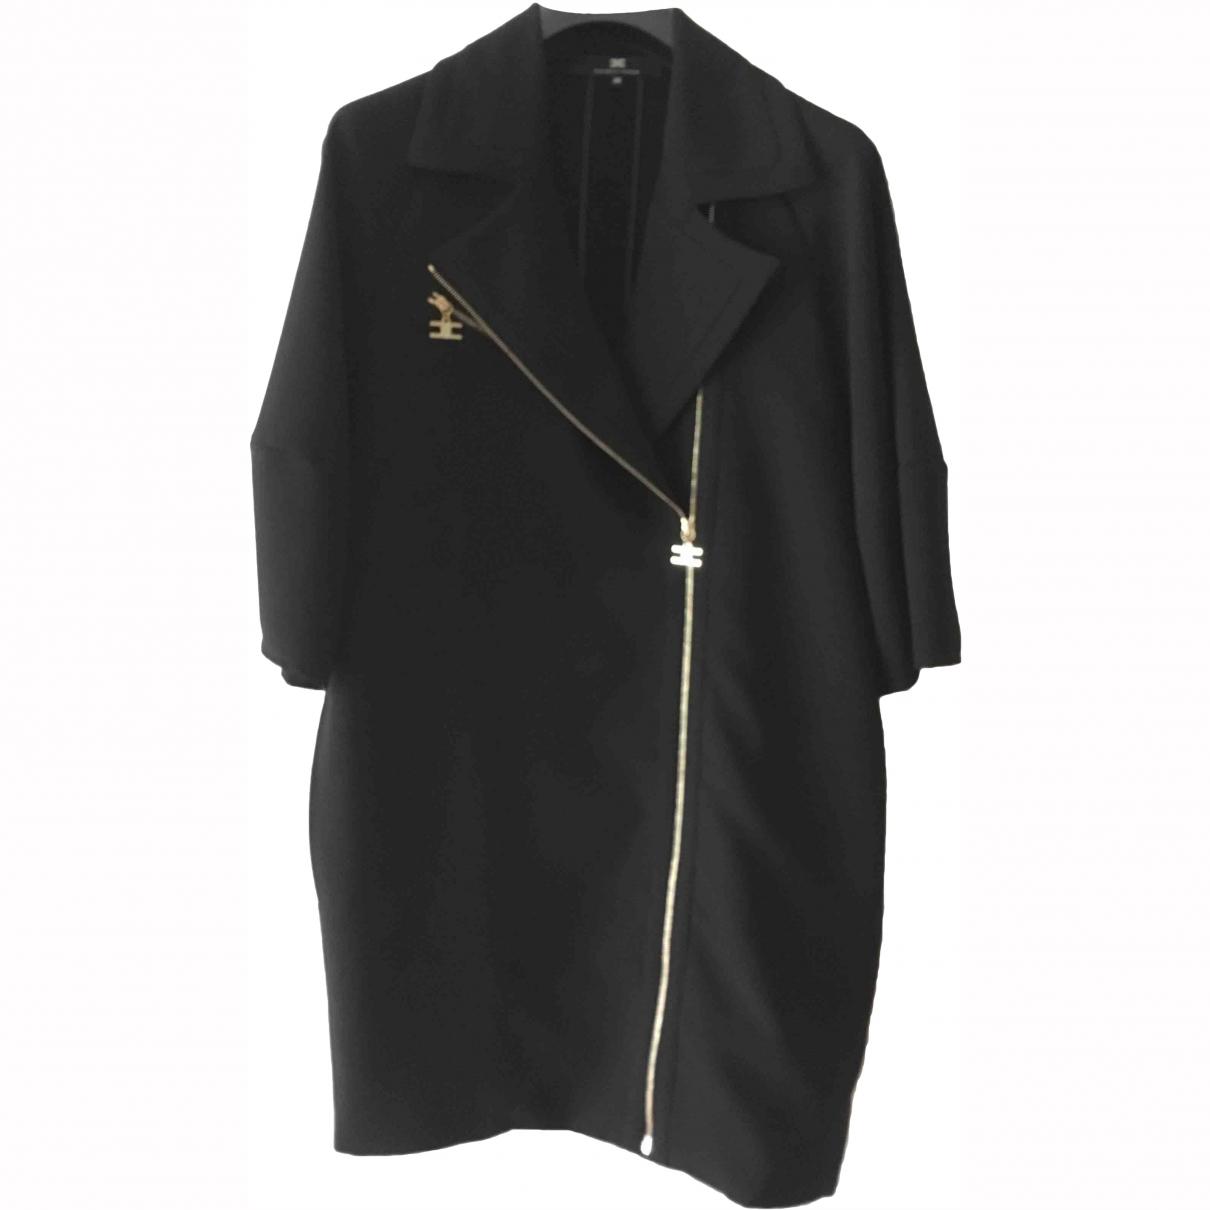 Elisabetta Franchi \N Black dress for Women 38 IT